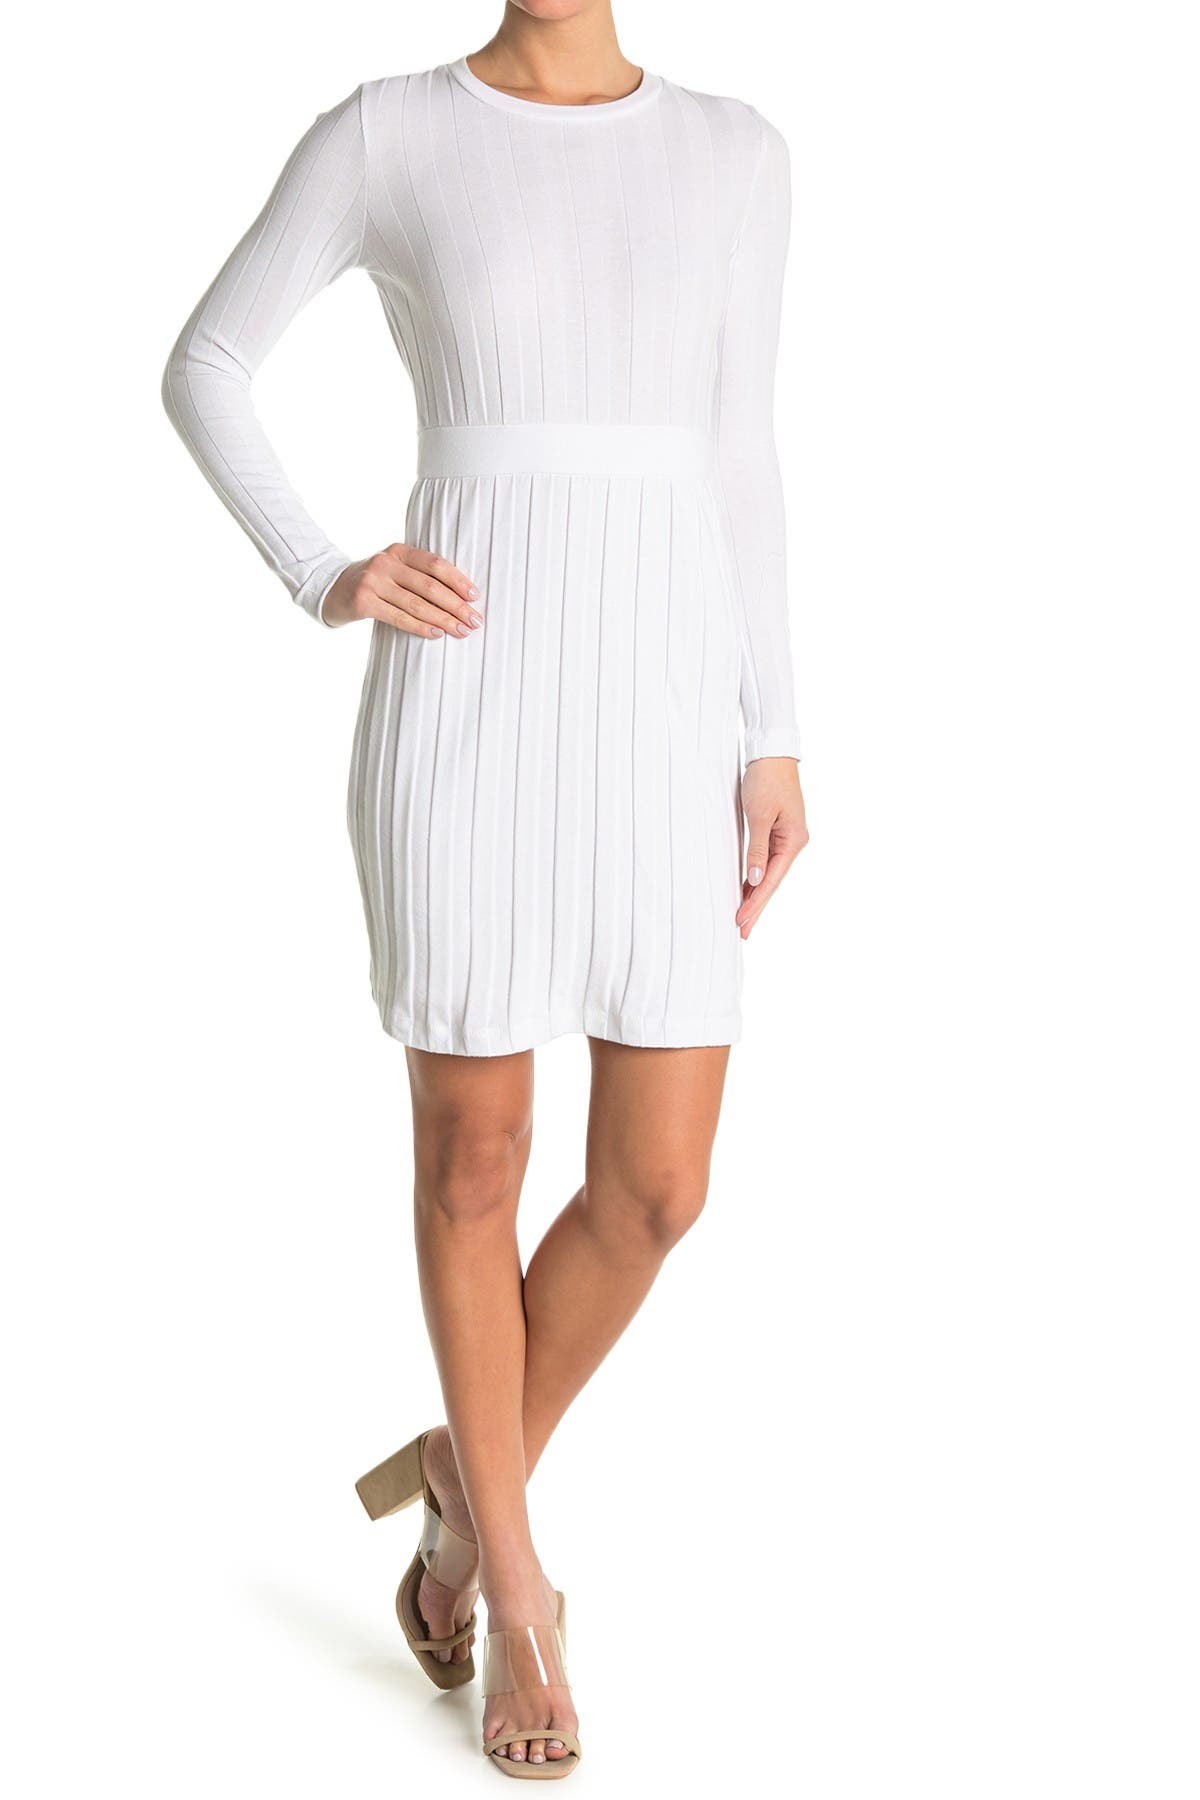 Image of BALDWIN Ora Ribbed Knit Mini Dress